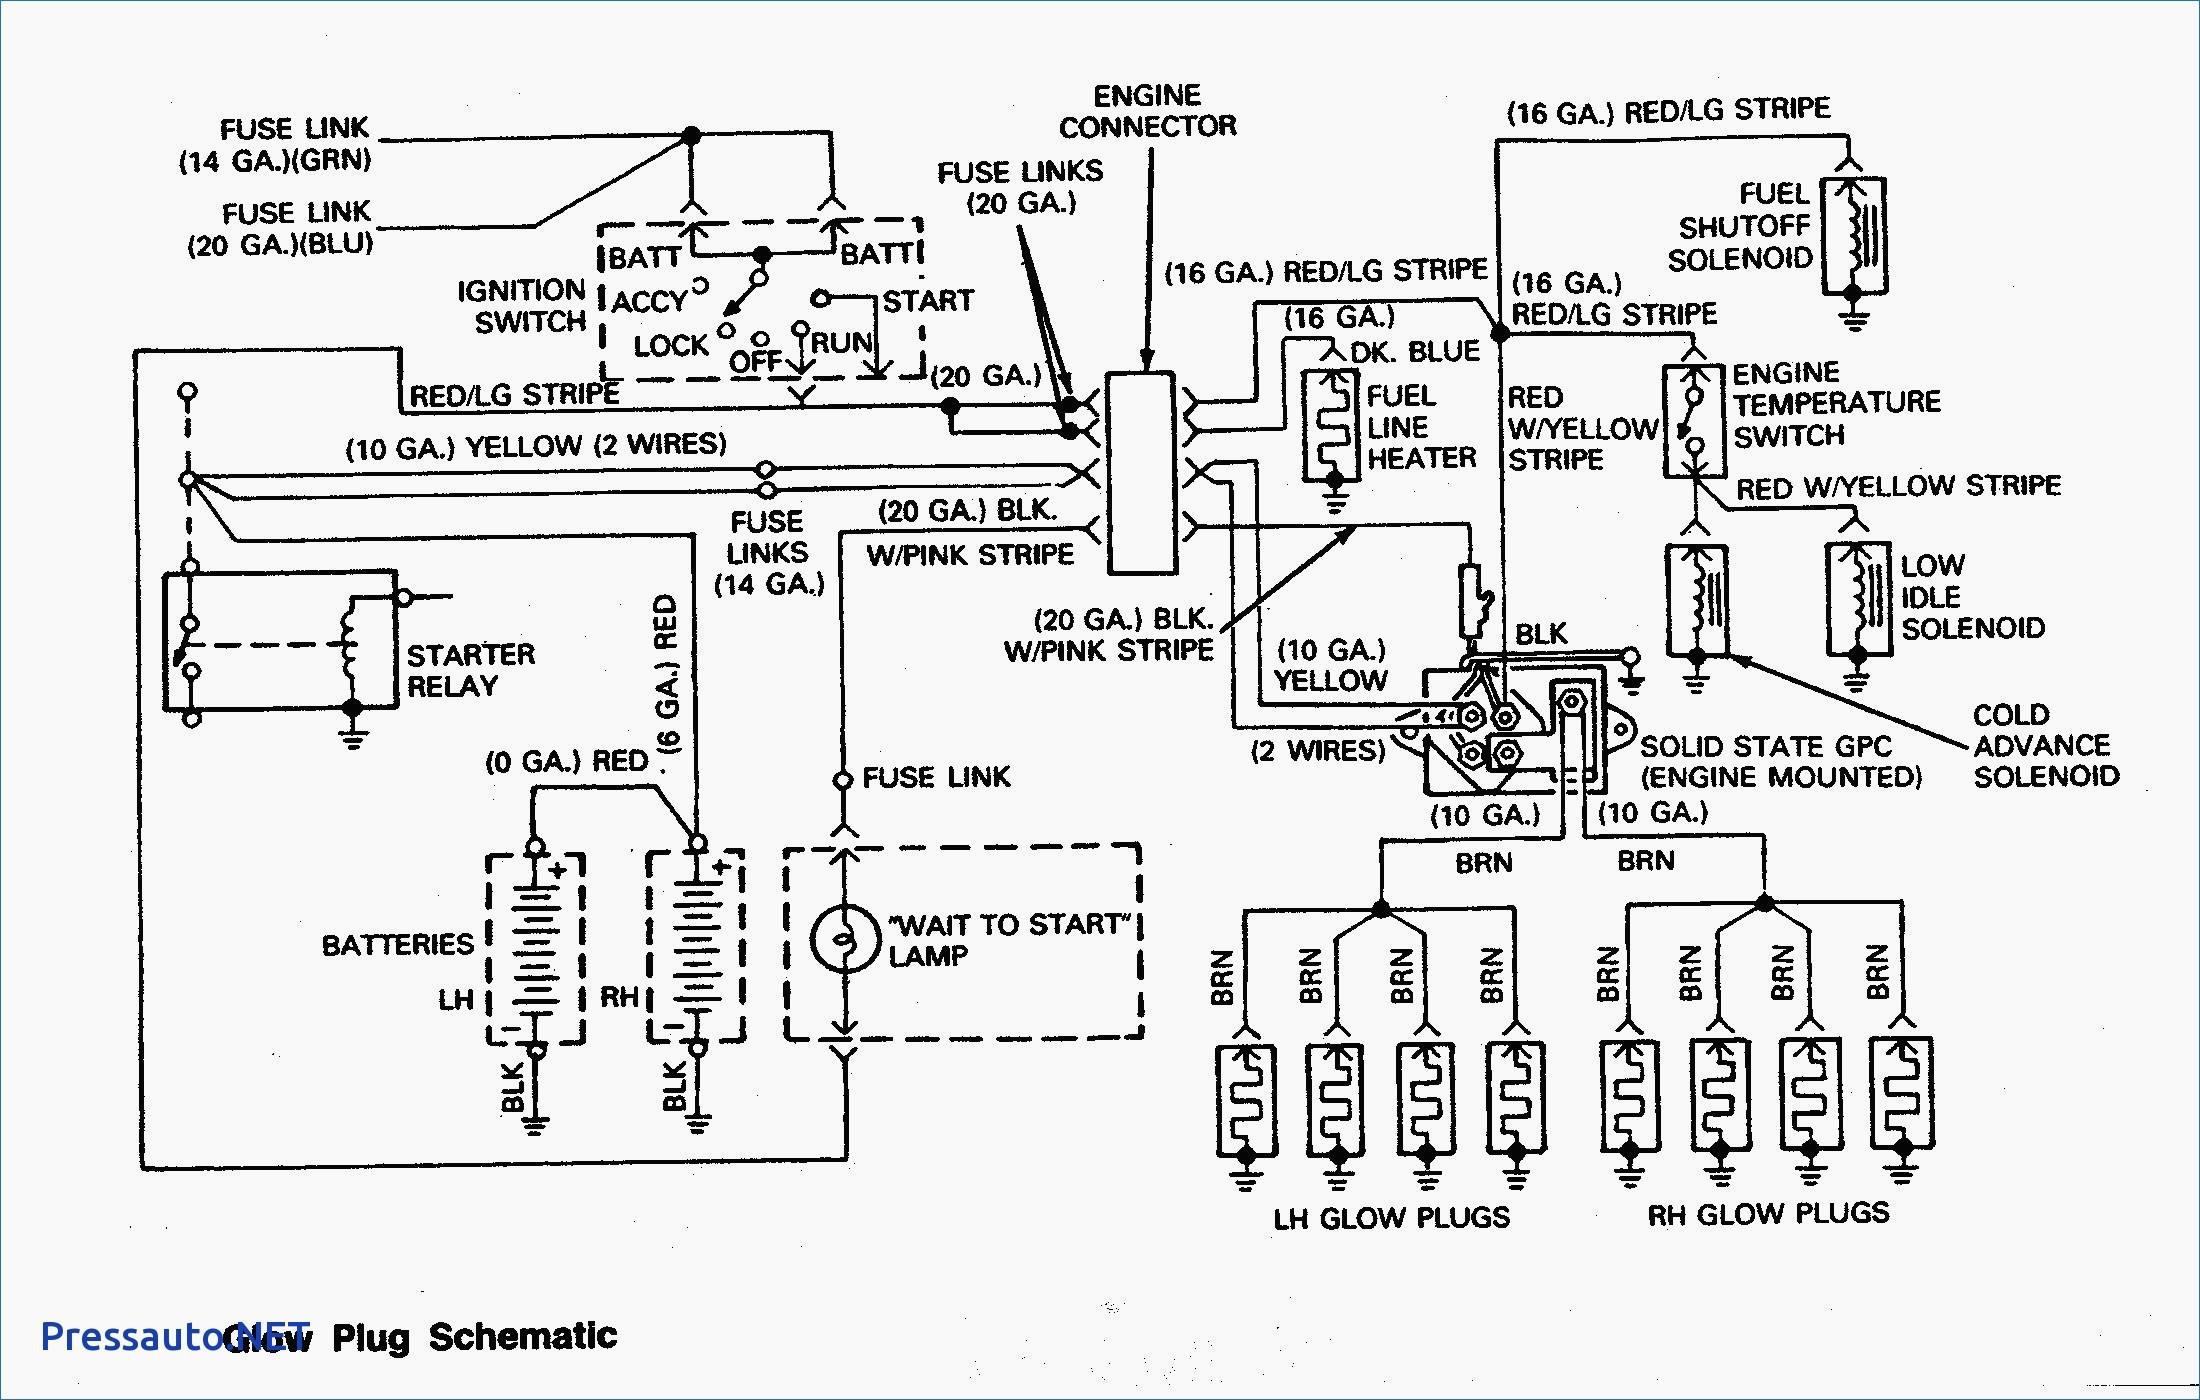 6.0 Powerstroke Ficm Wiring Diagram Download